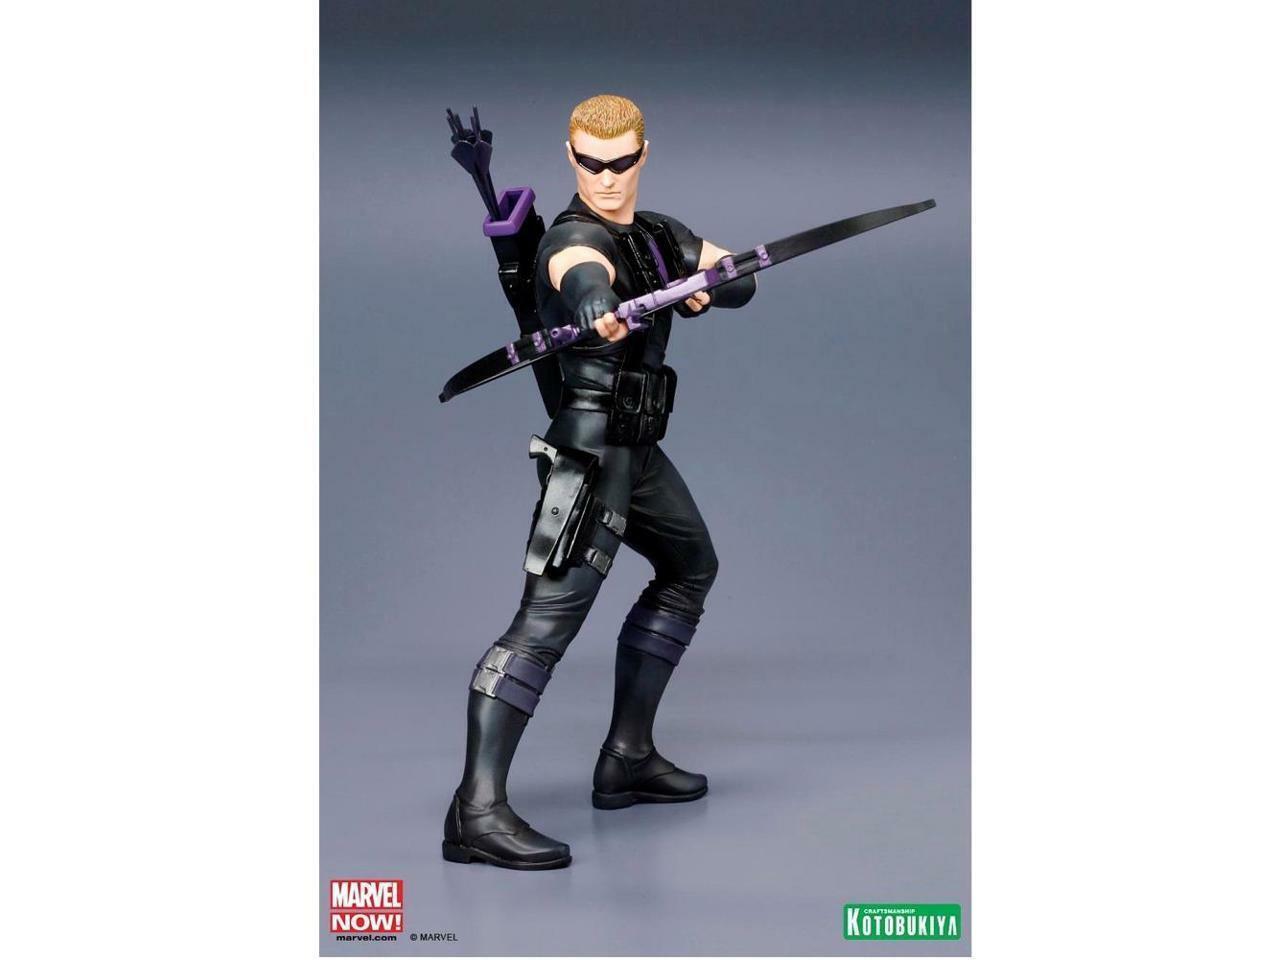 Avengers Marvel Now  1 10 Scale ArtFX+ Statue  Hawkeye